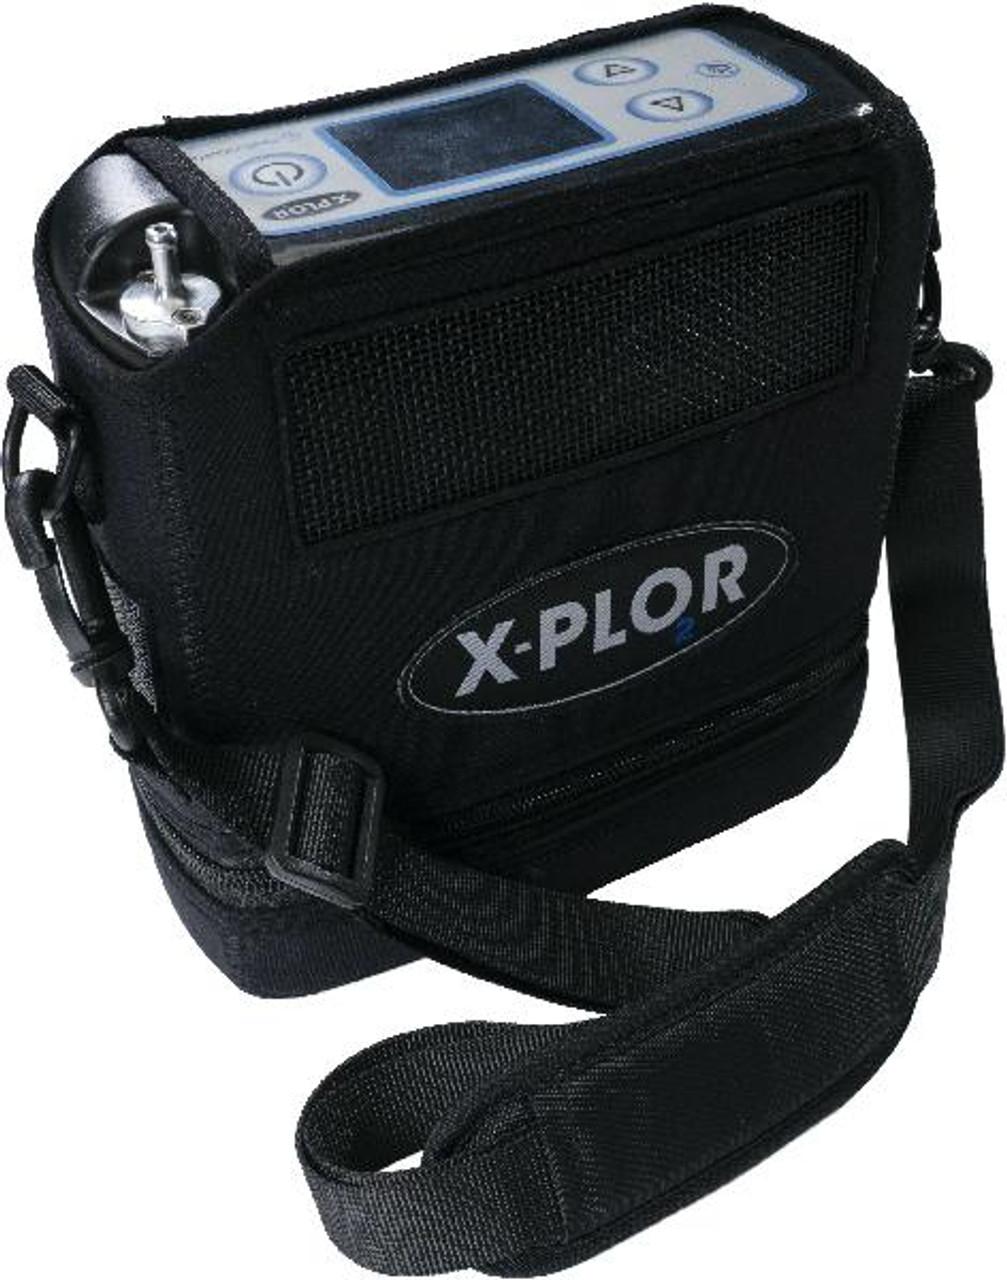 Xplor Portable Oxygen System with Carry Case